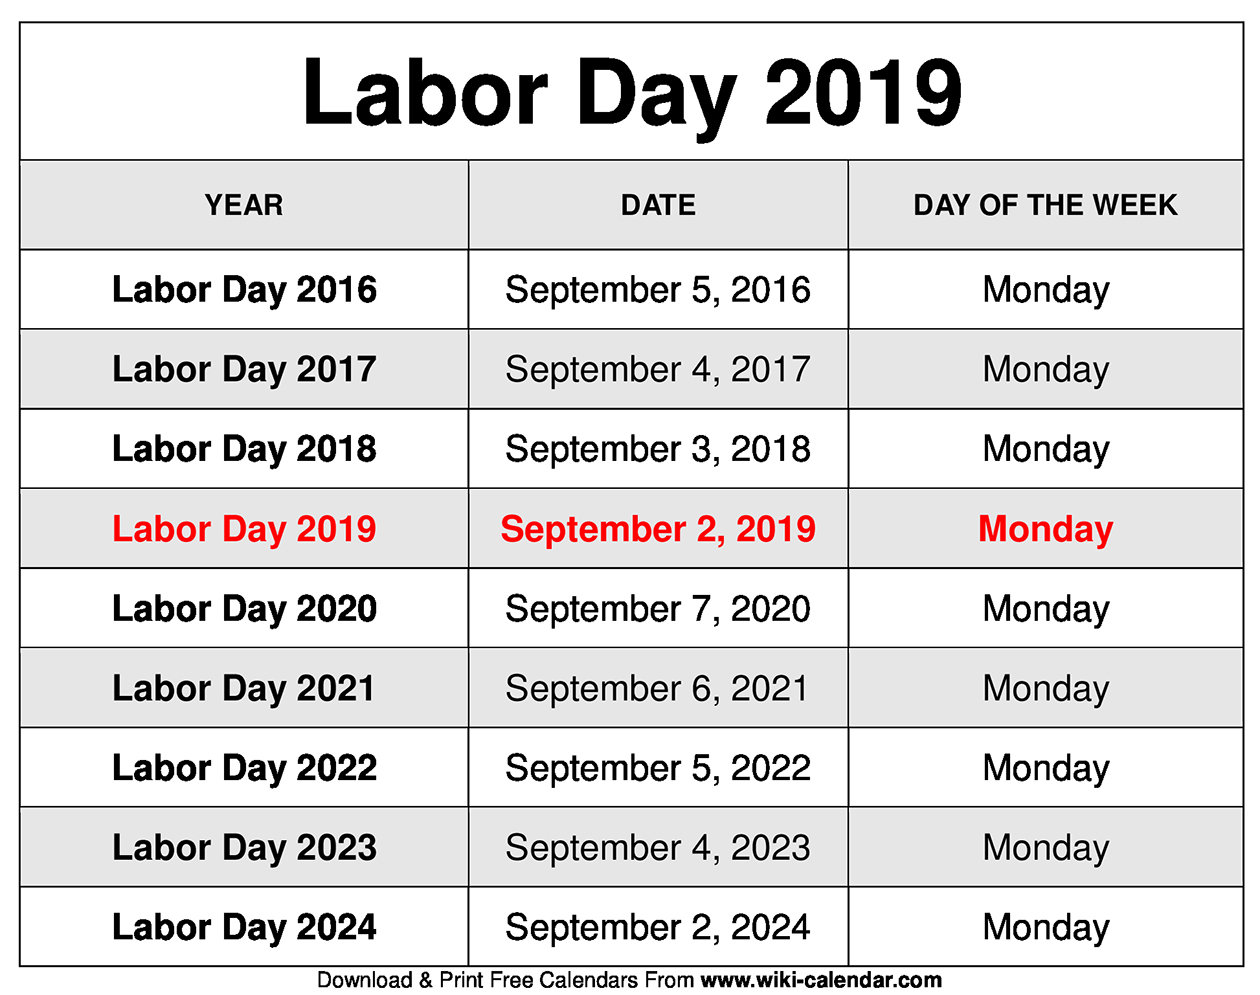 Labor Day 2019 Calendar